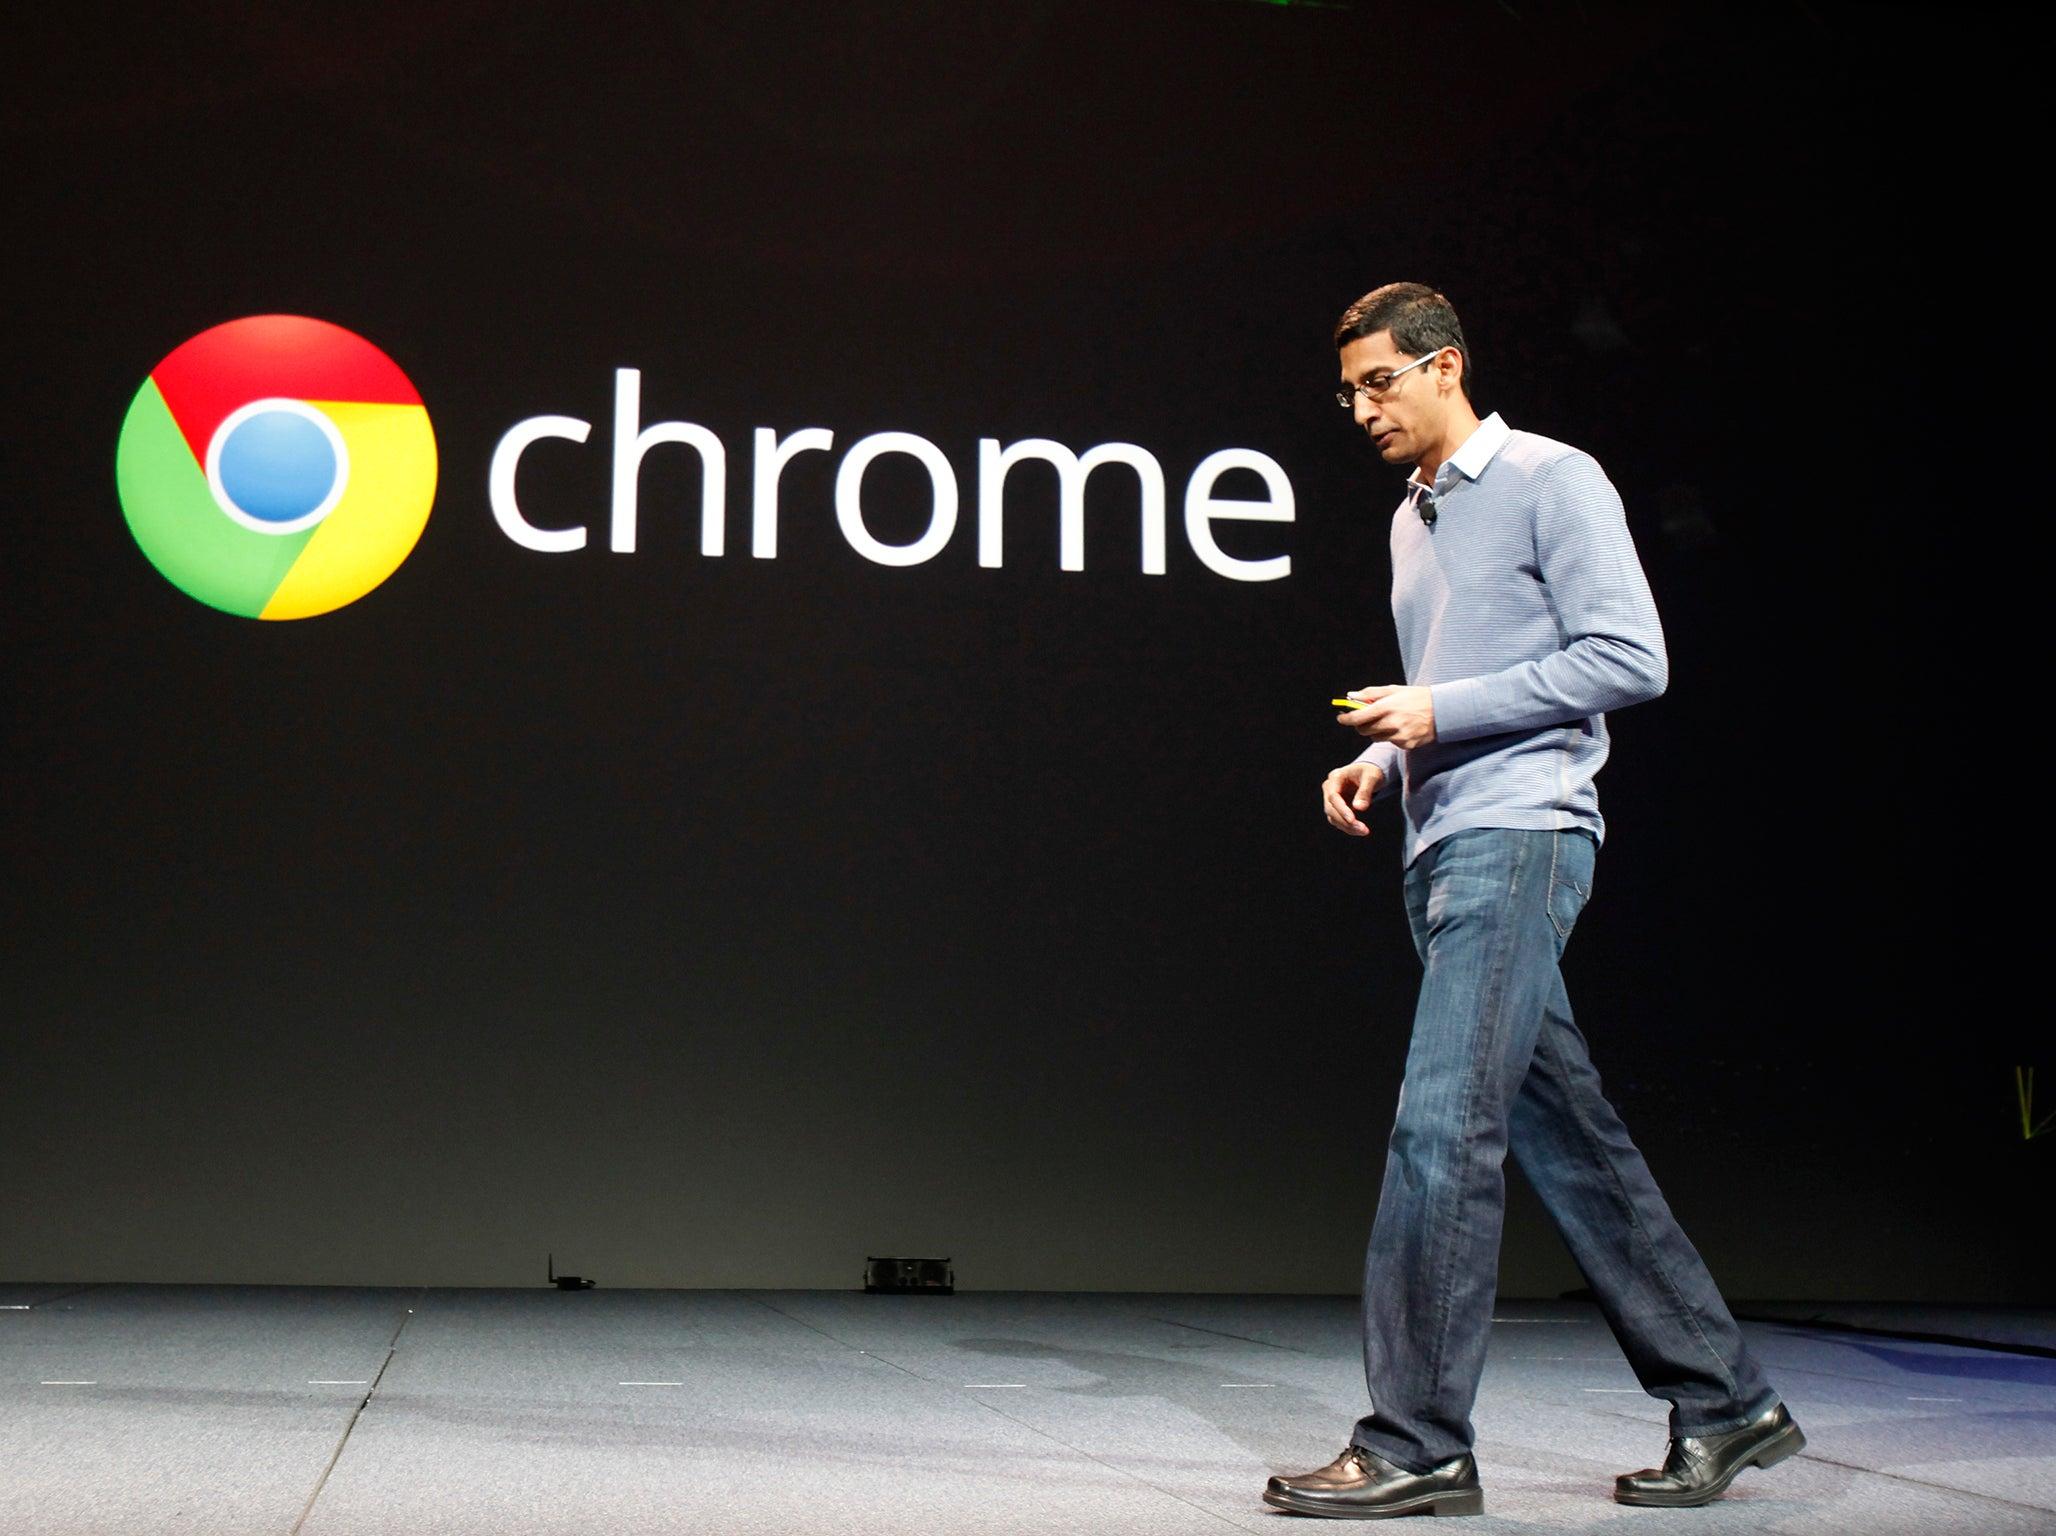 Google Chrome Scam Tricks Users into Emailing Bank Details to Criminals